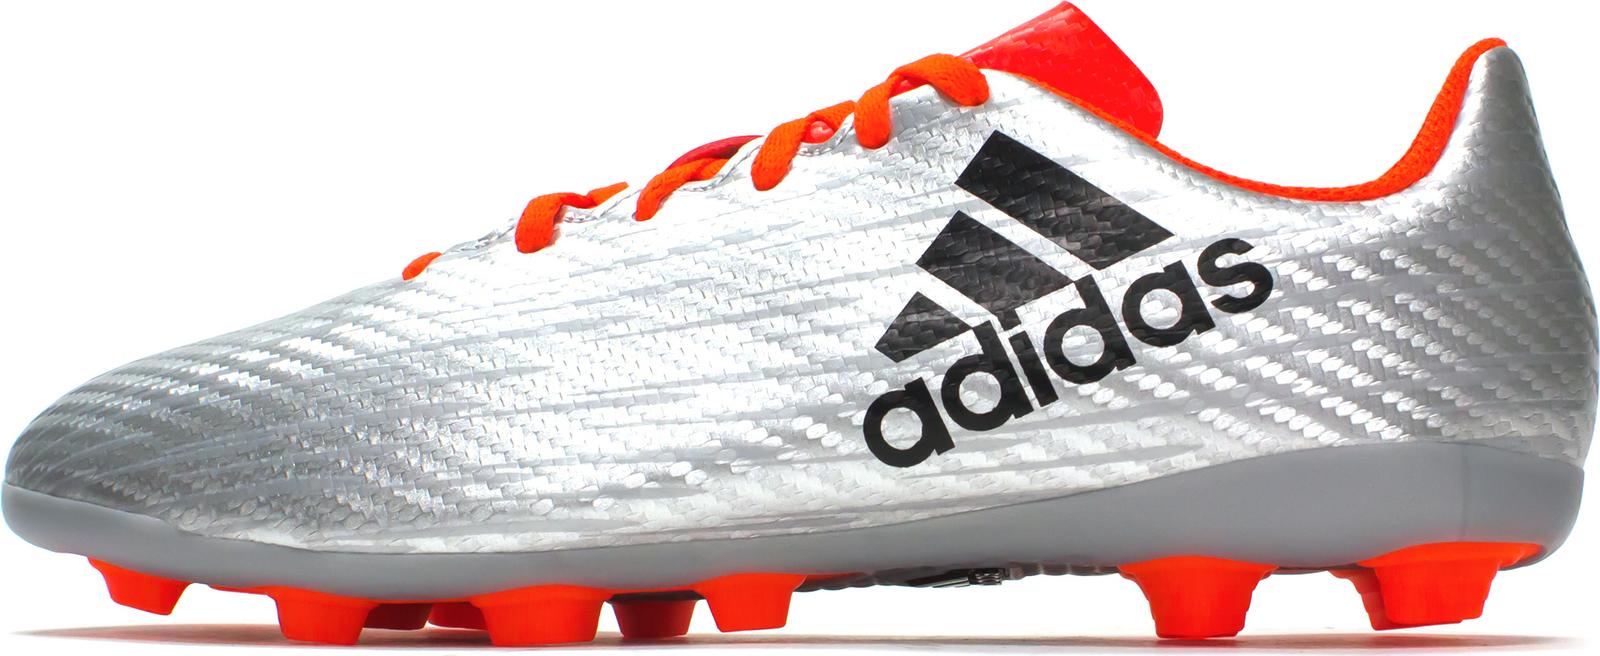 sports shoes 9dc8e 8bbdd Adidas X 16.4 FXG J S75699